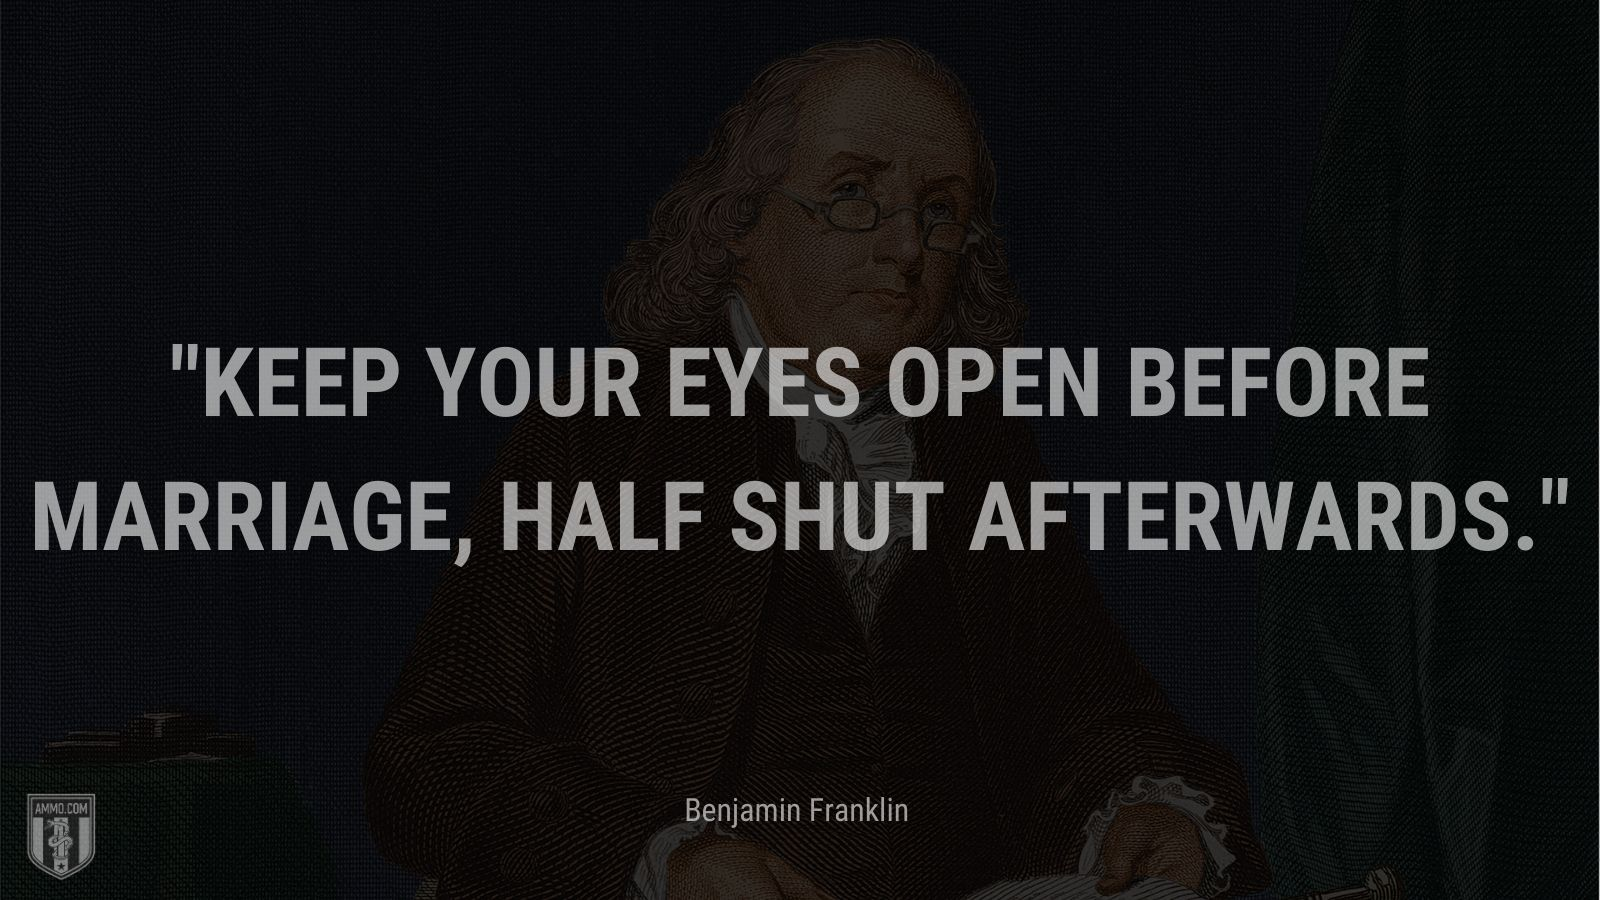 """Keep your eyes open before marriage, half shut afterwards."" - Benjamin Franklin"